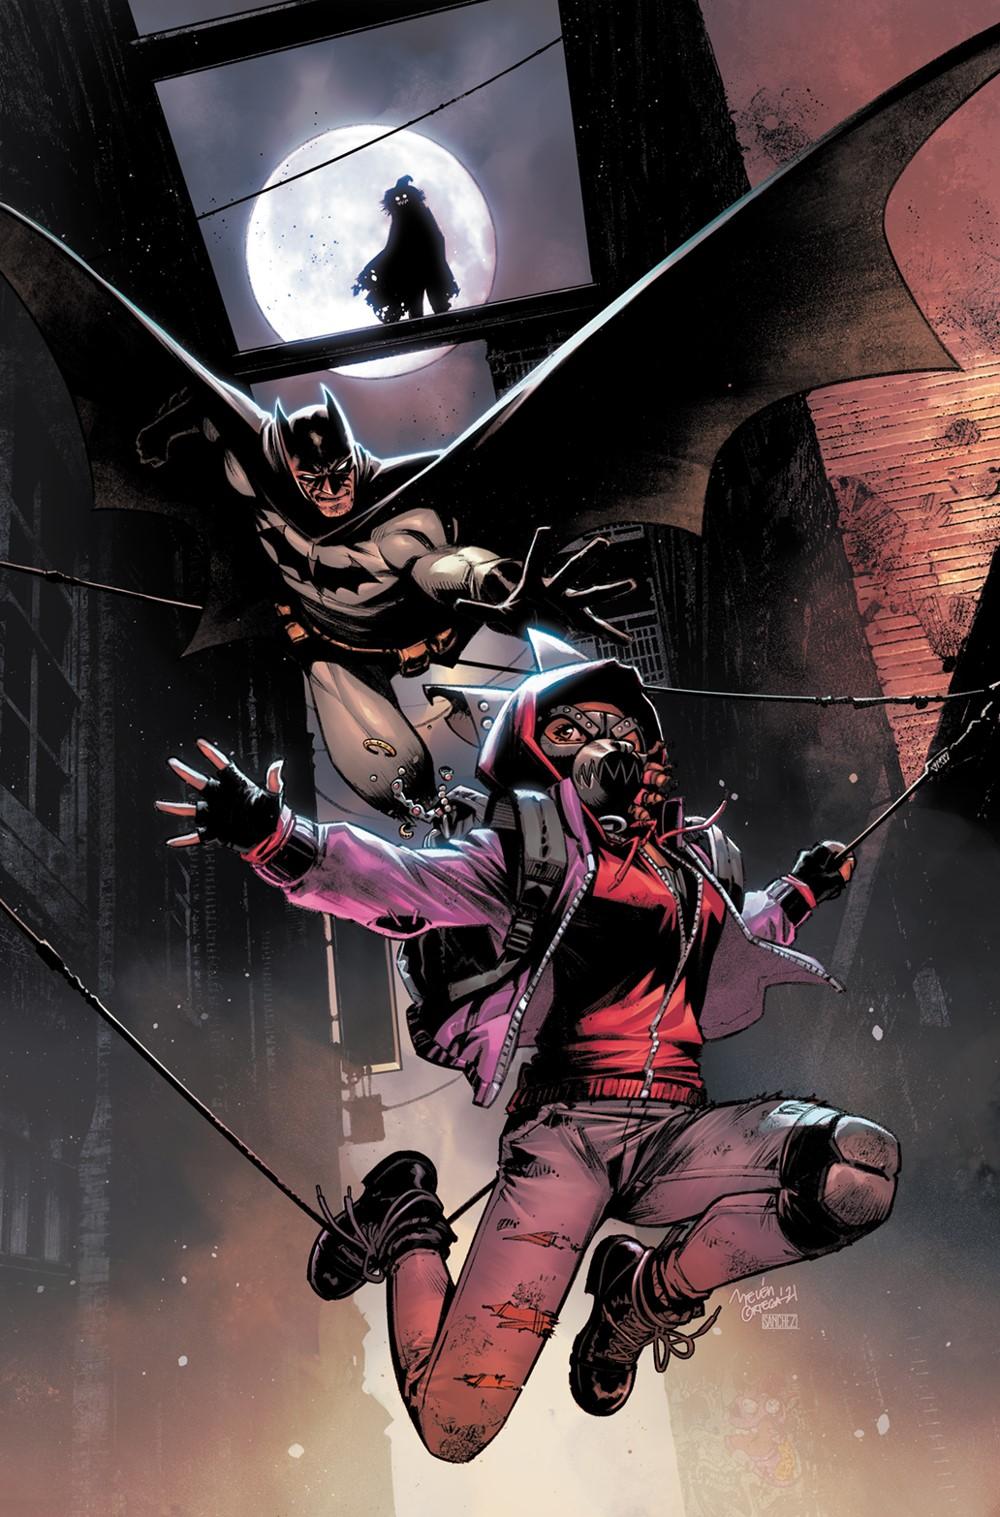 Legends-of-the-Dark-Knight-Cv8-Main-Cover DC Comics December 2021 Solicitations